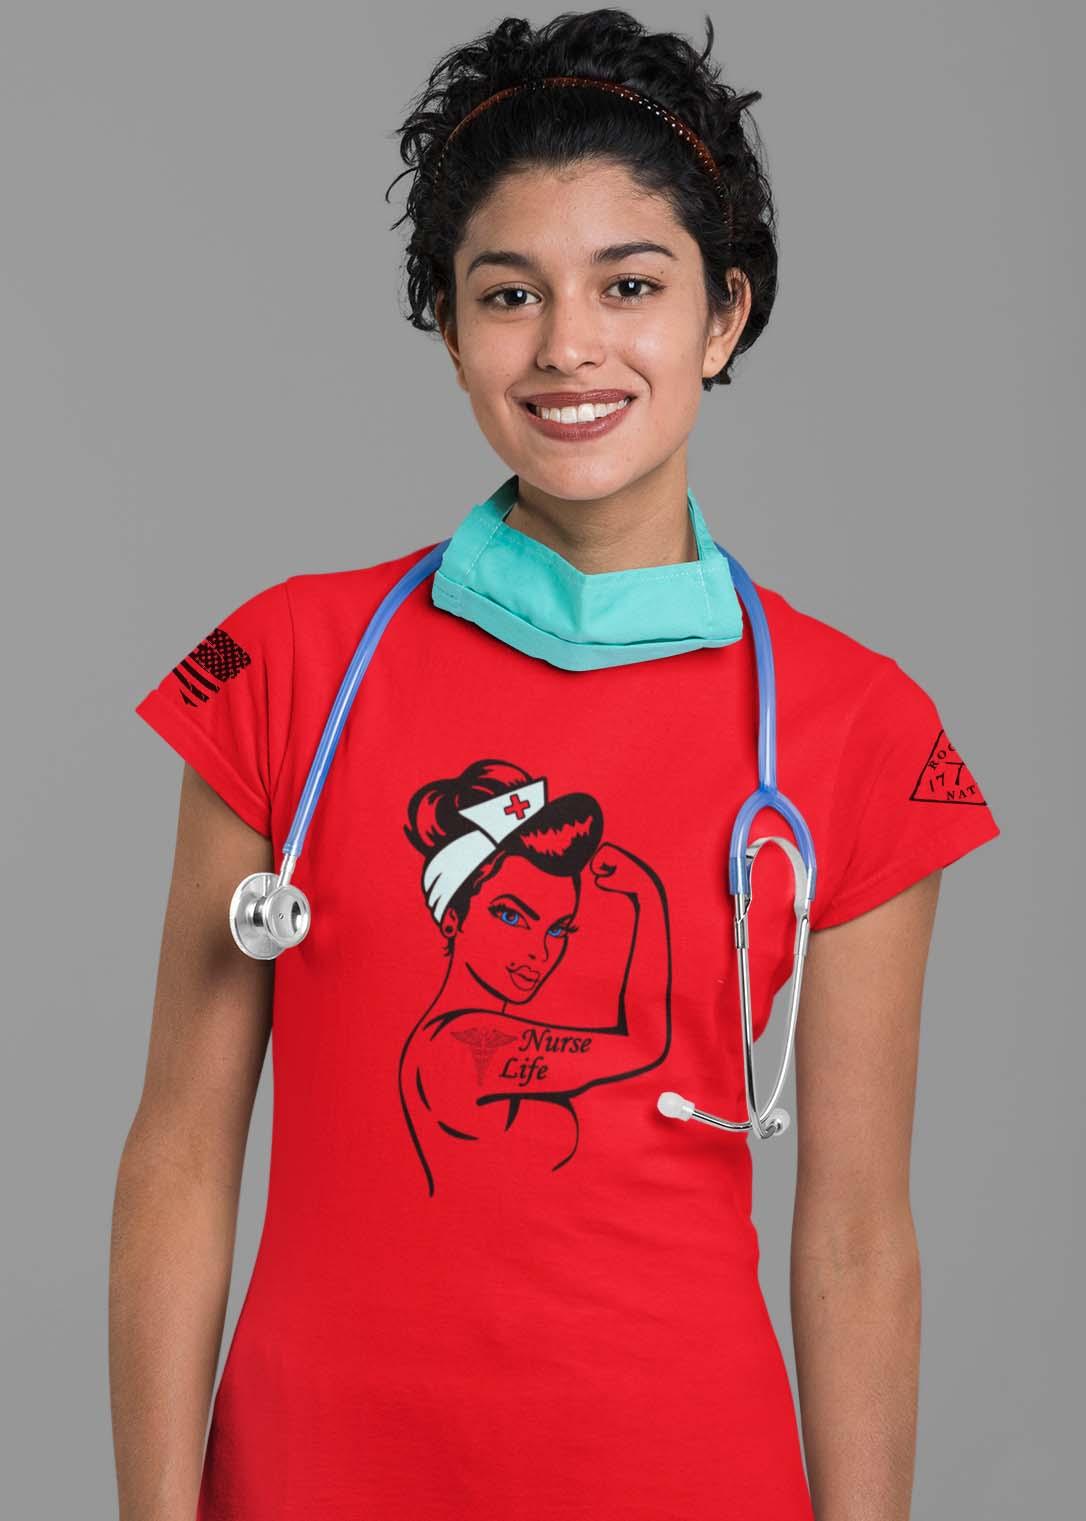 nurse life on women's red